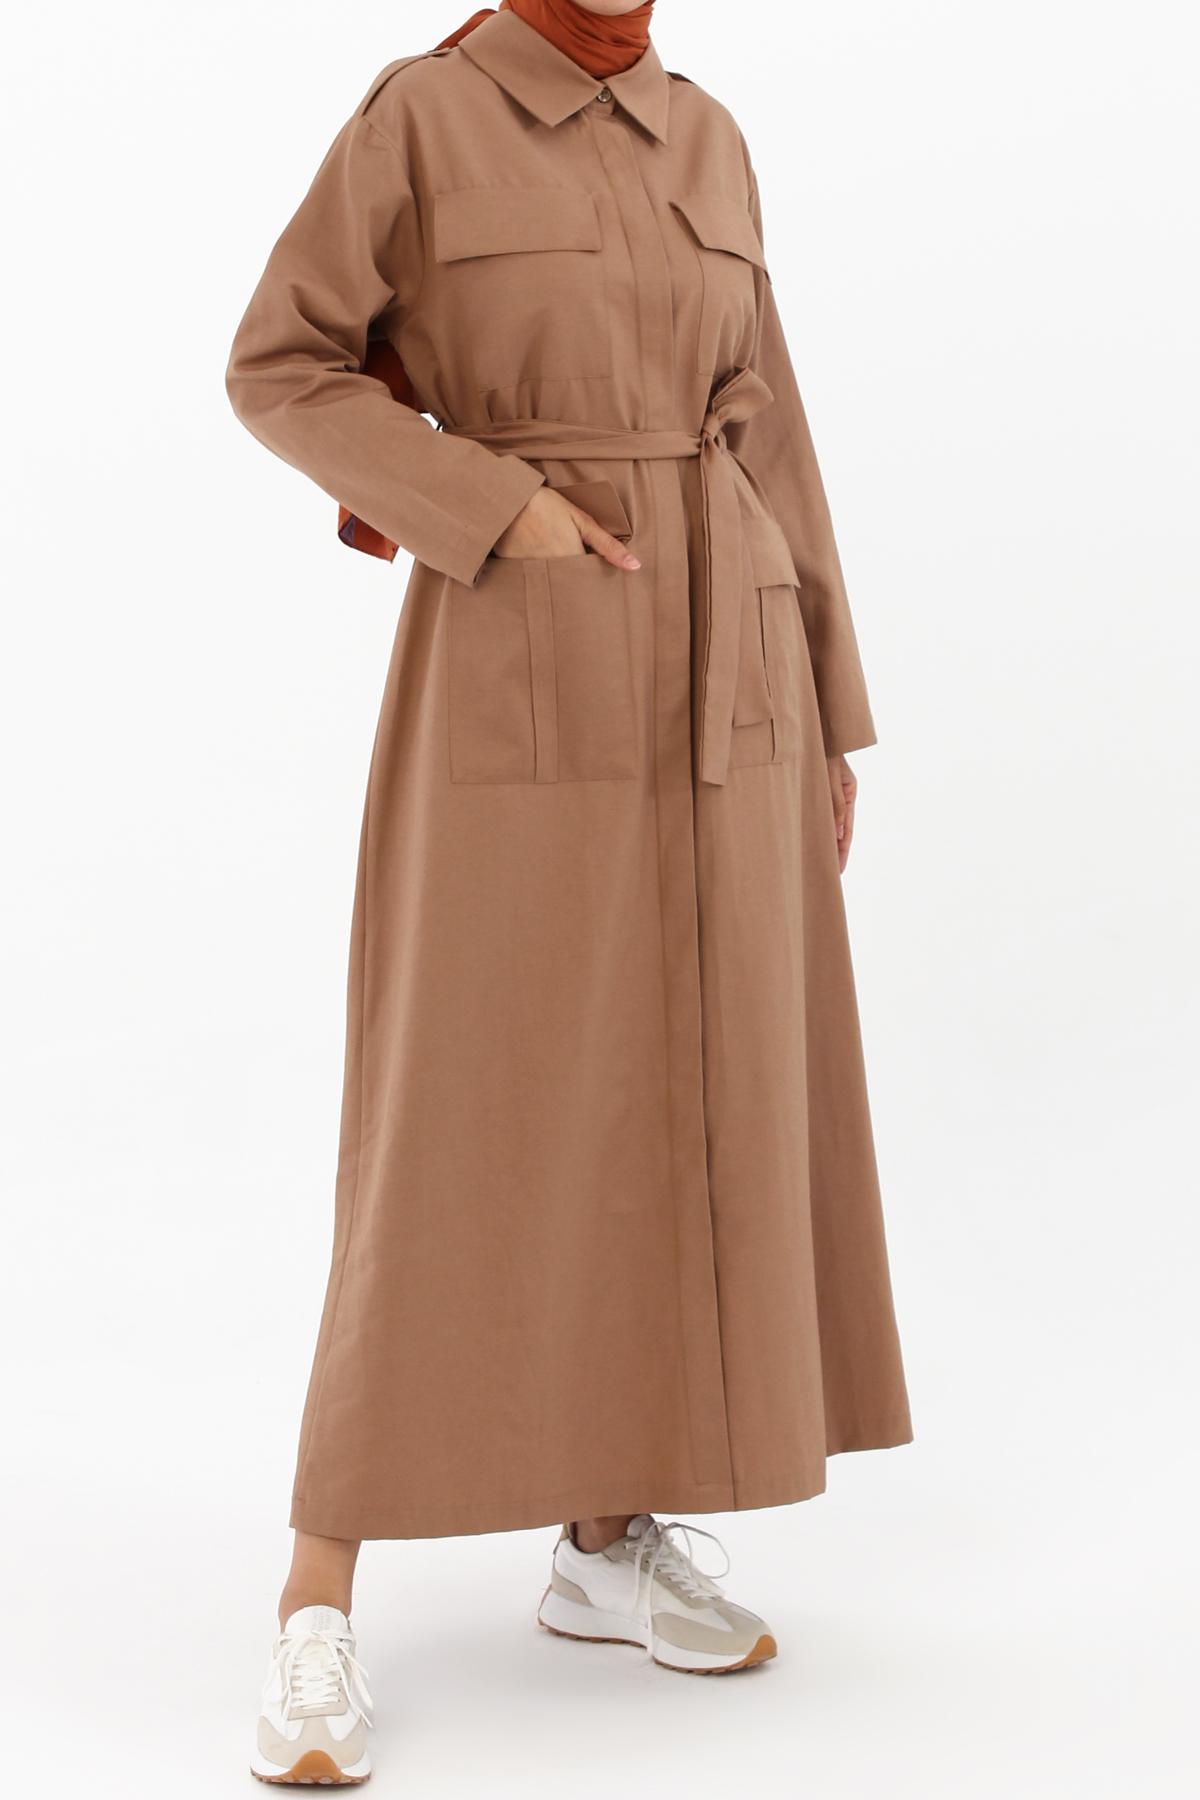 Zippered Pocket Self Belted Abaya